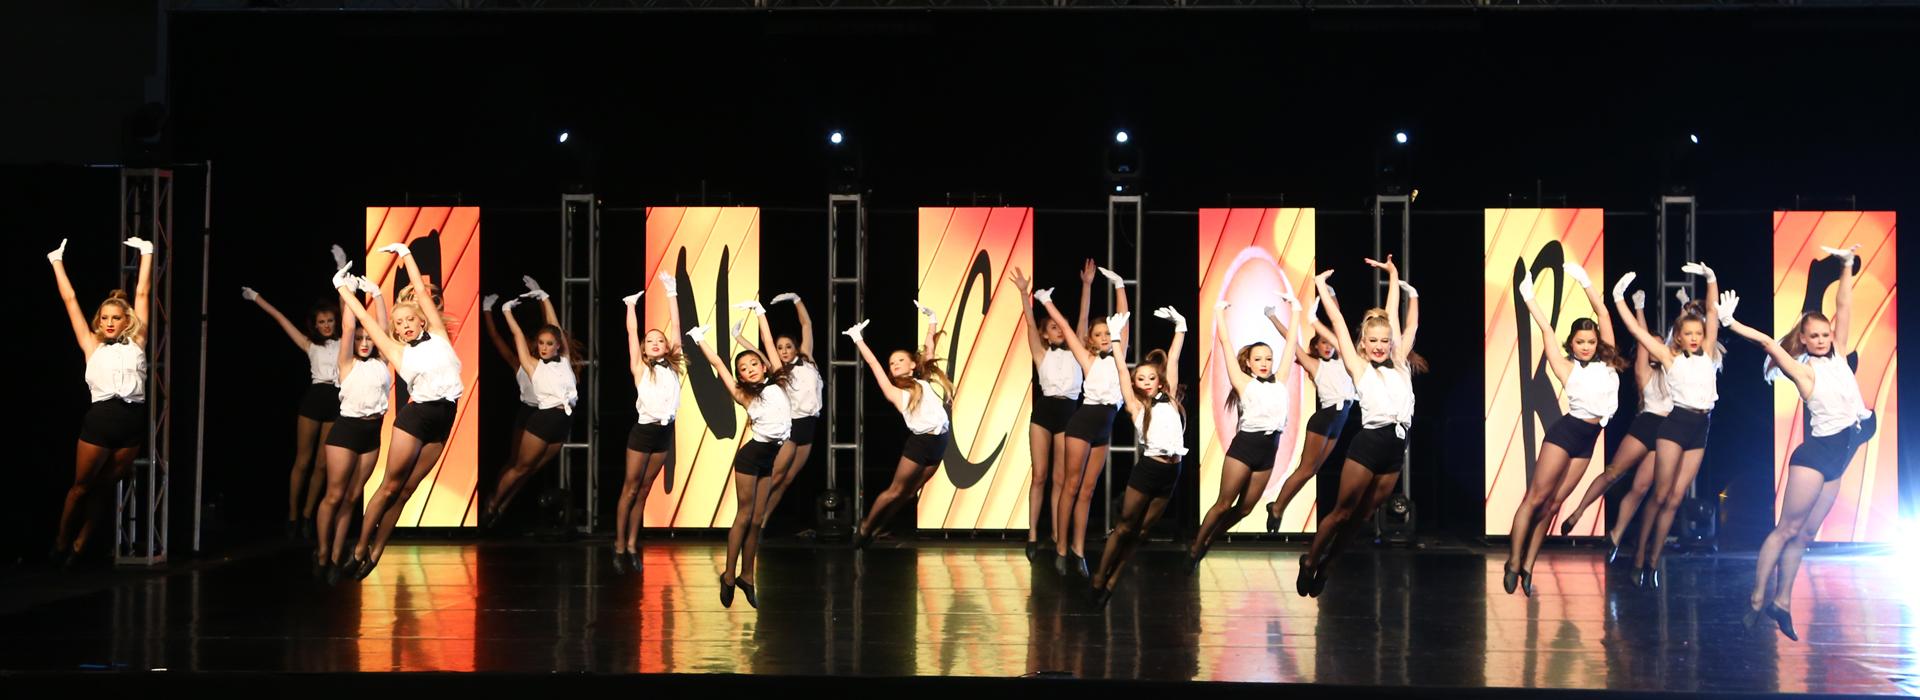 Really pleases la mesa dance academy albuquerque nm agree